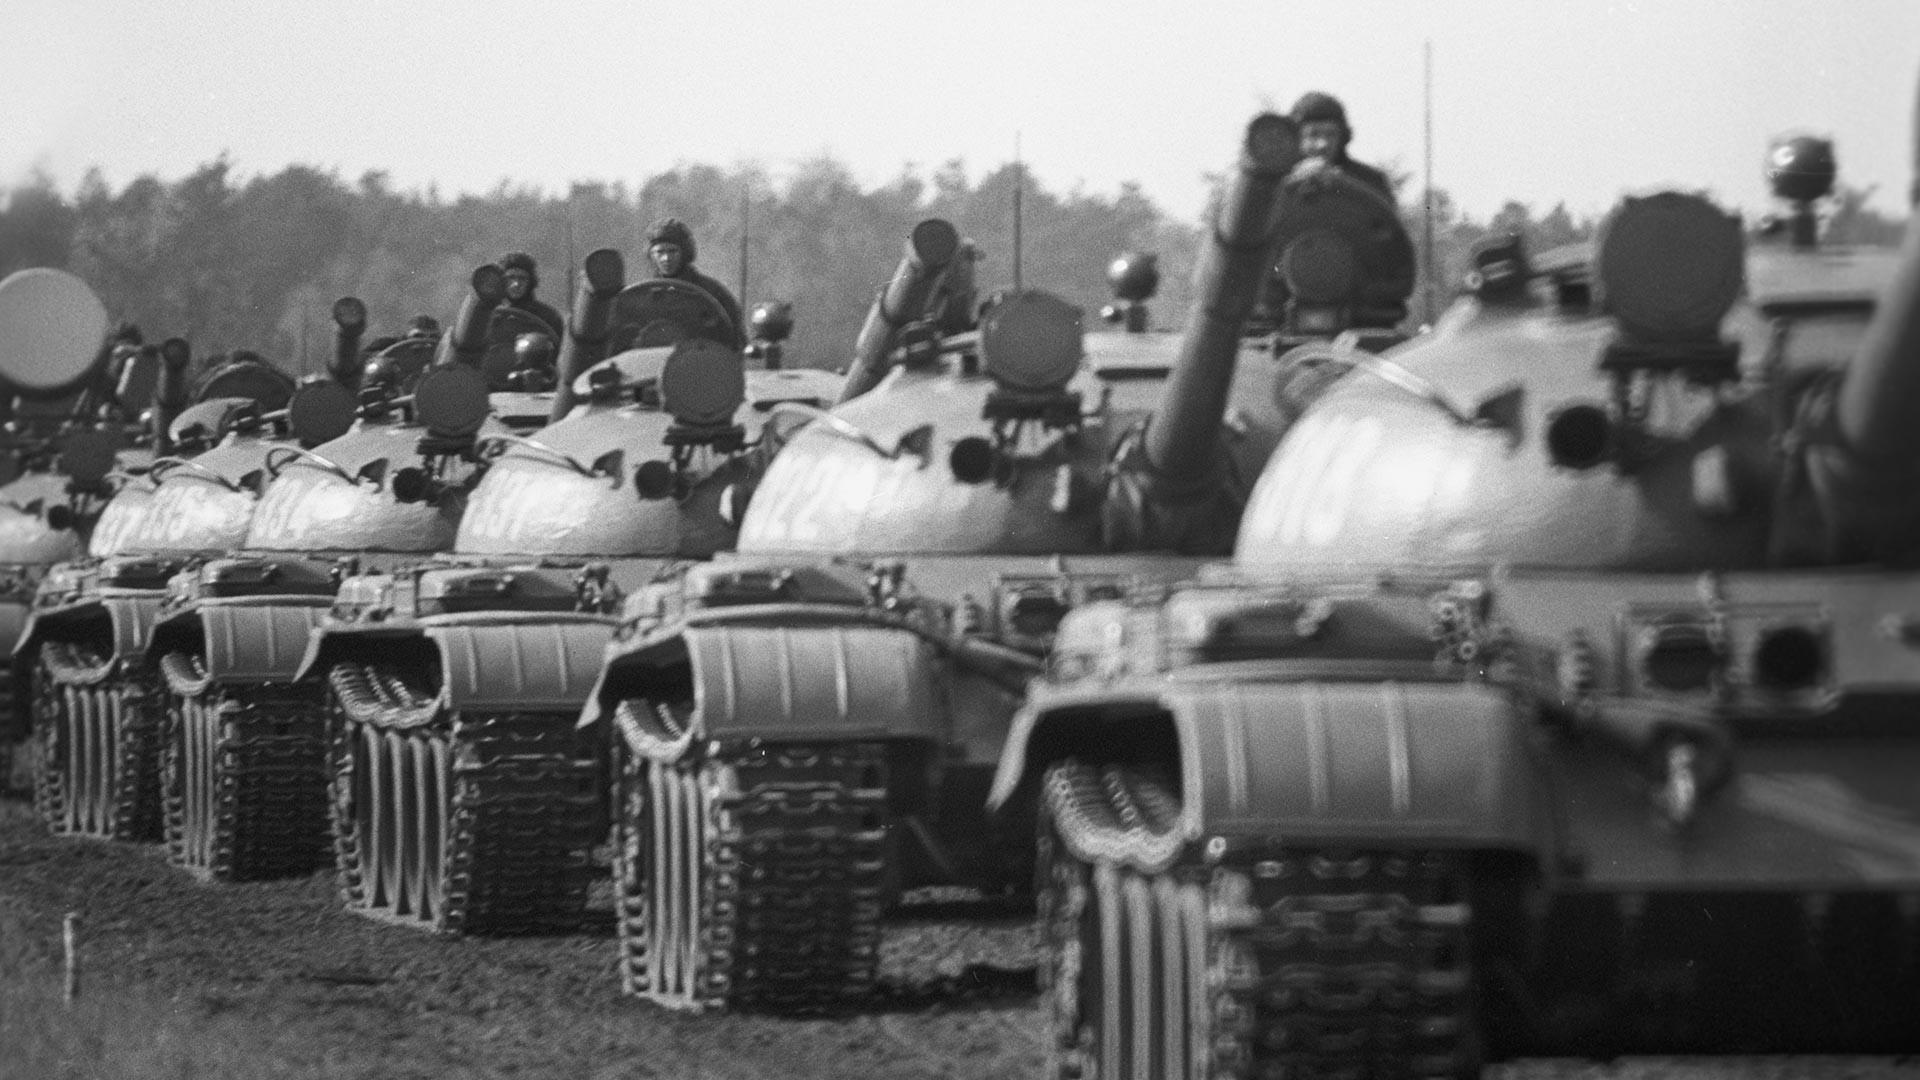 Soviet tanks during